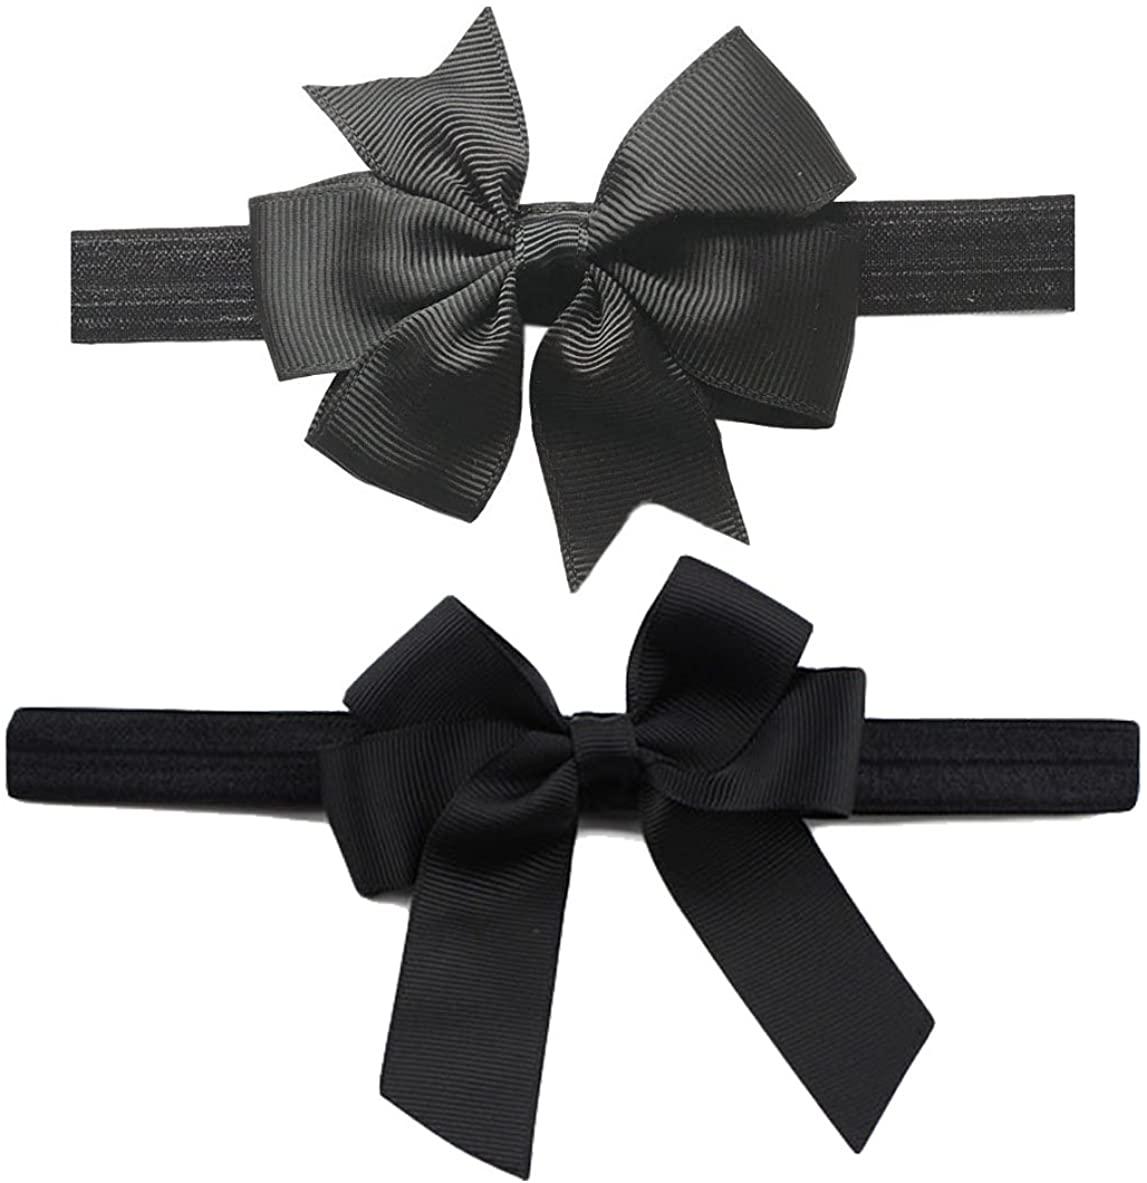 Black Baby Girls Headband Grosgrain Ribbon Hairband Hair Bows Set S01